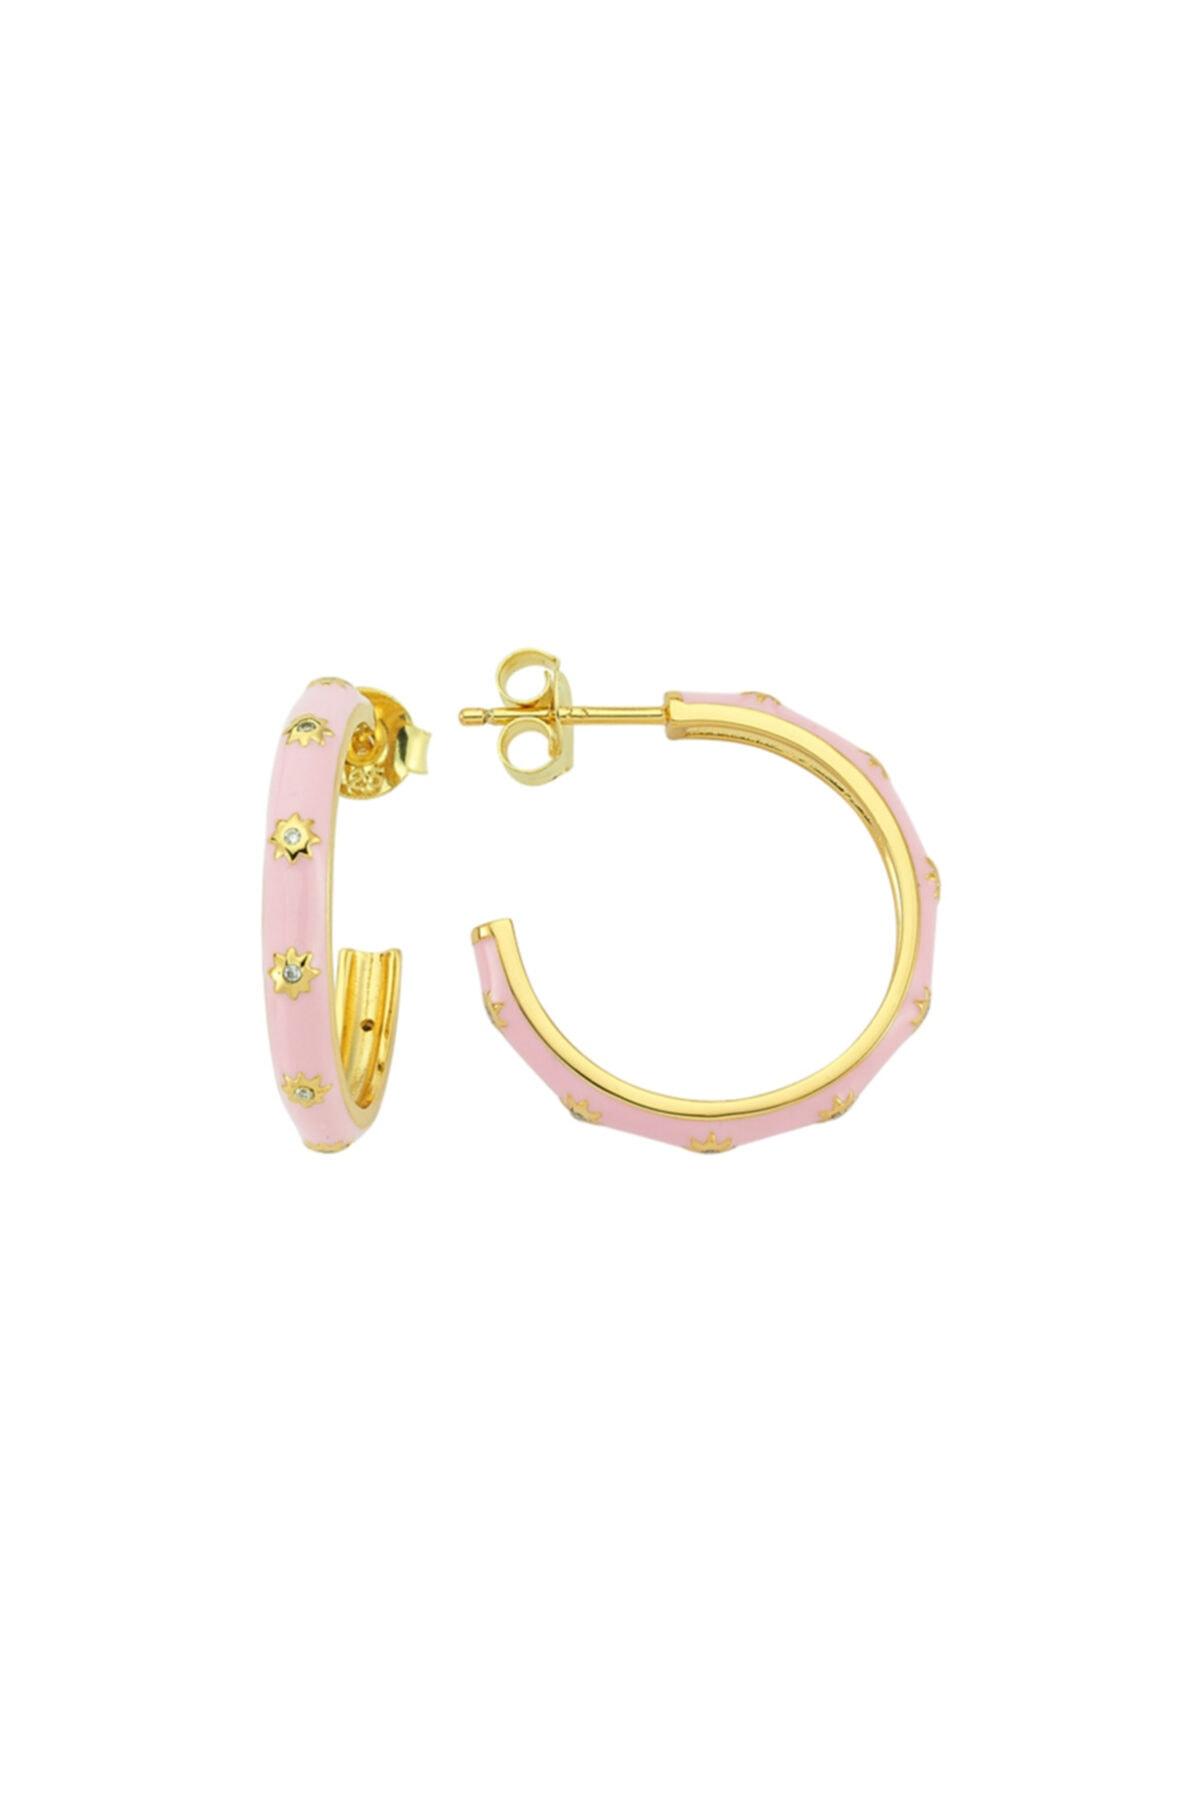 Luzdemia White Hoop Earr. 925 - Pink 1